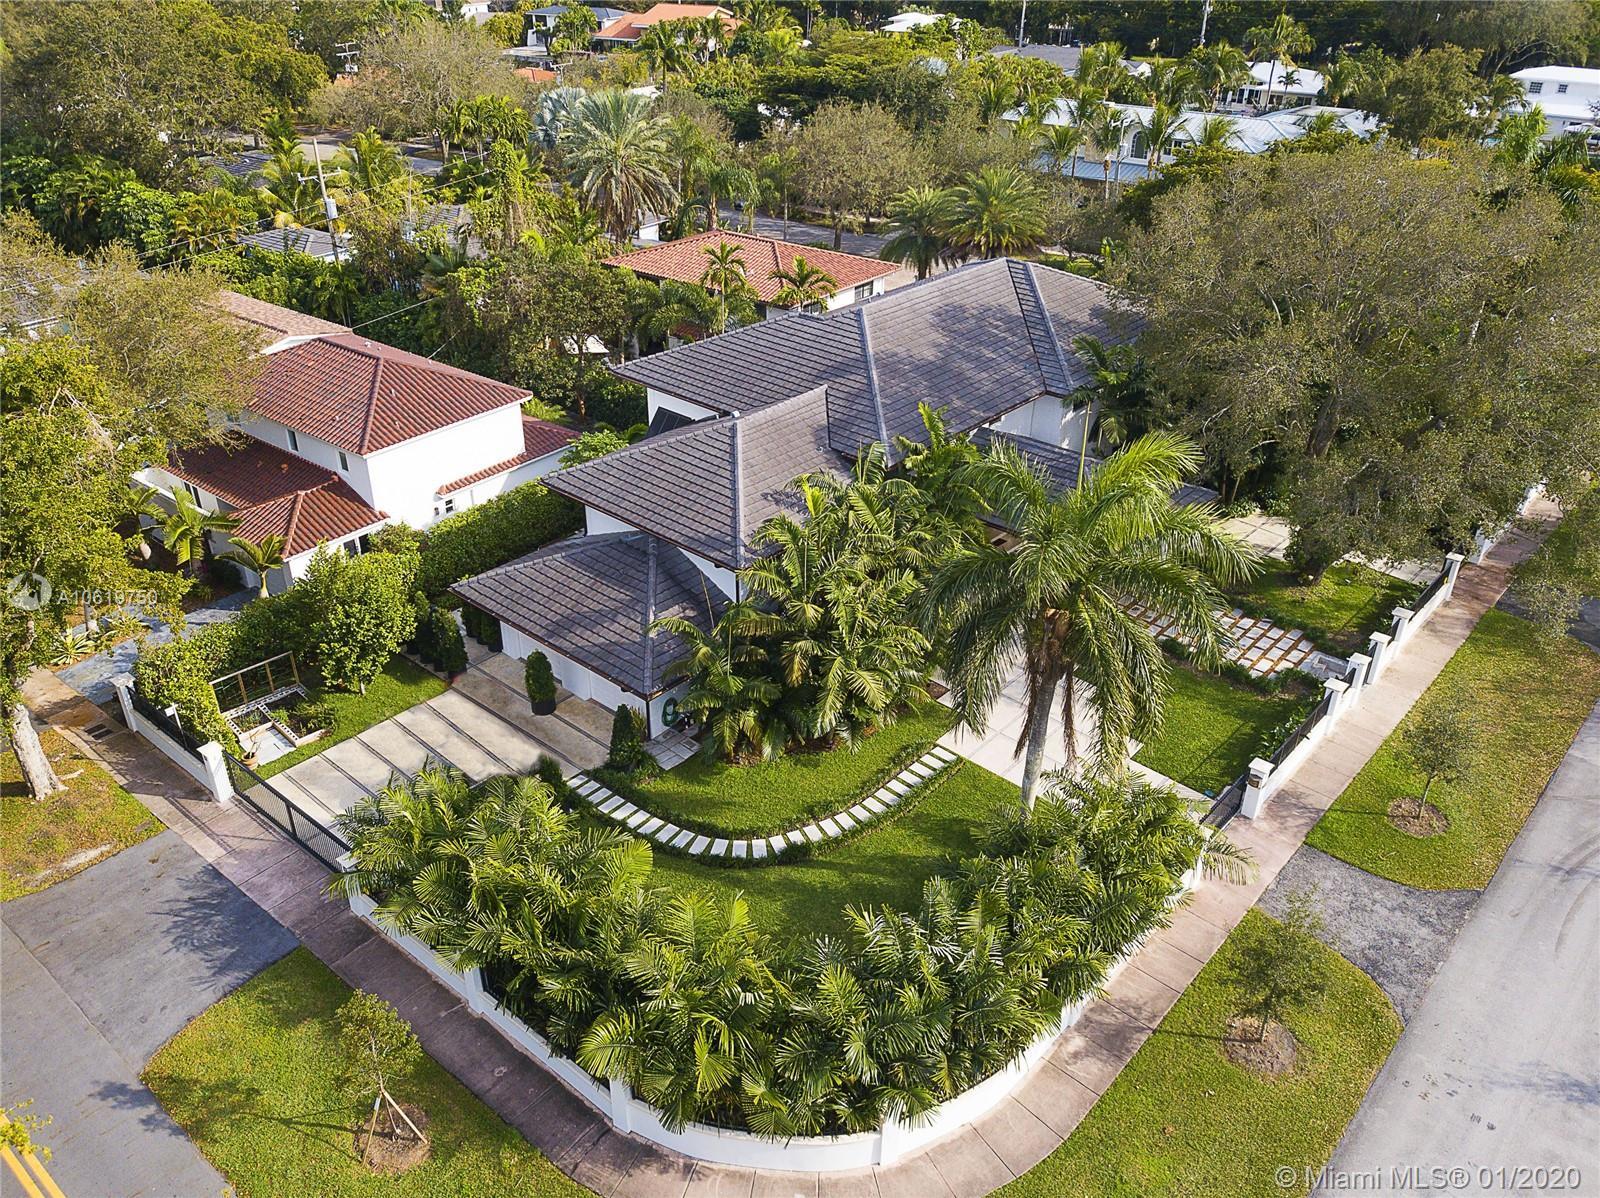 6611 Leonardo St, Coral Gables, Florida